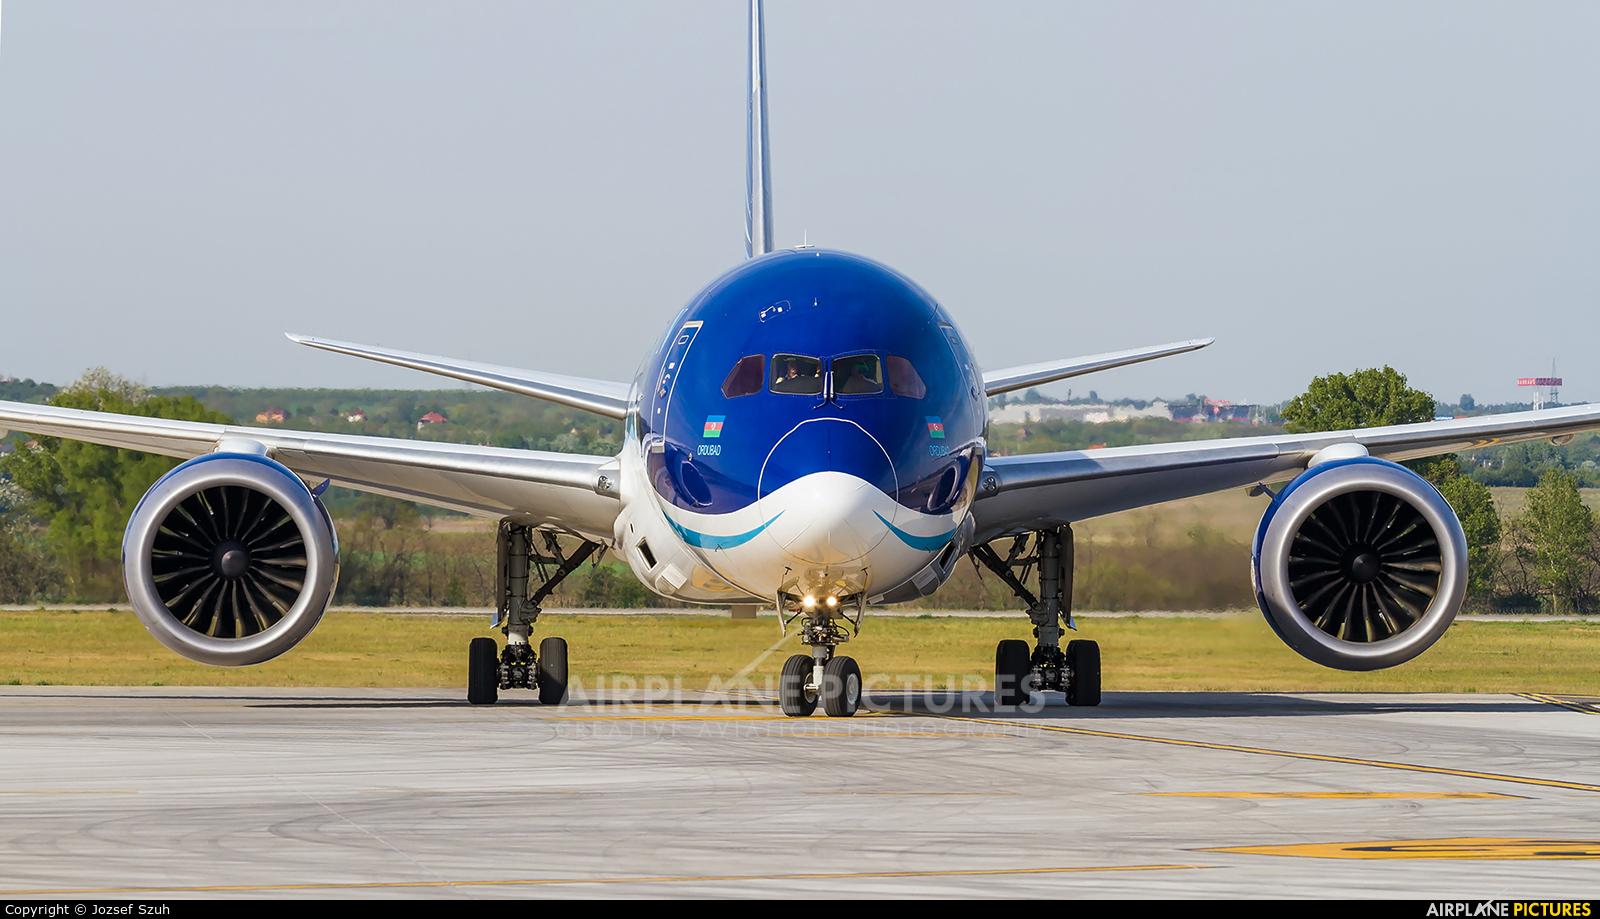 Azerbaijan Airlines VP-BBS aircraft at Budapest Ferenc Liszt International Airport